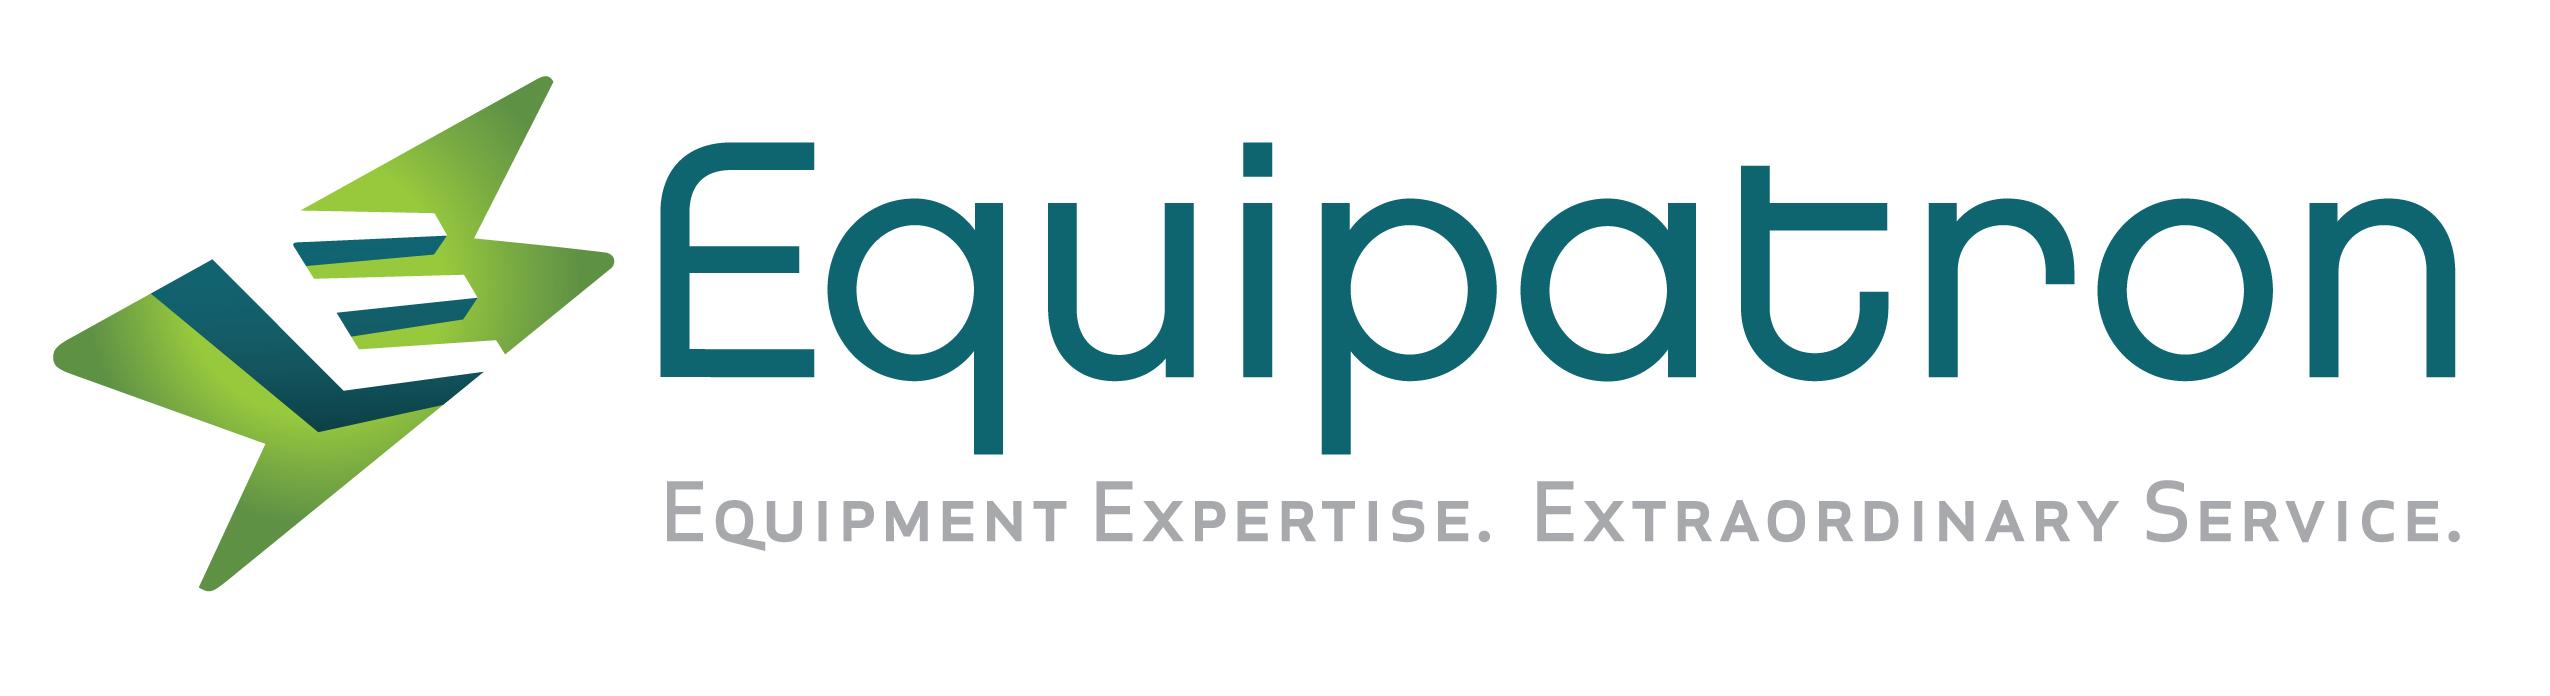 Equipatron Logo_Ebay